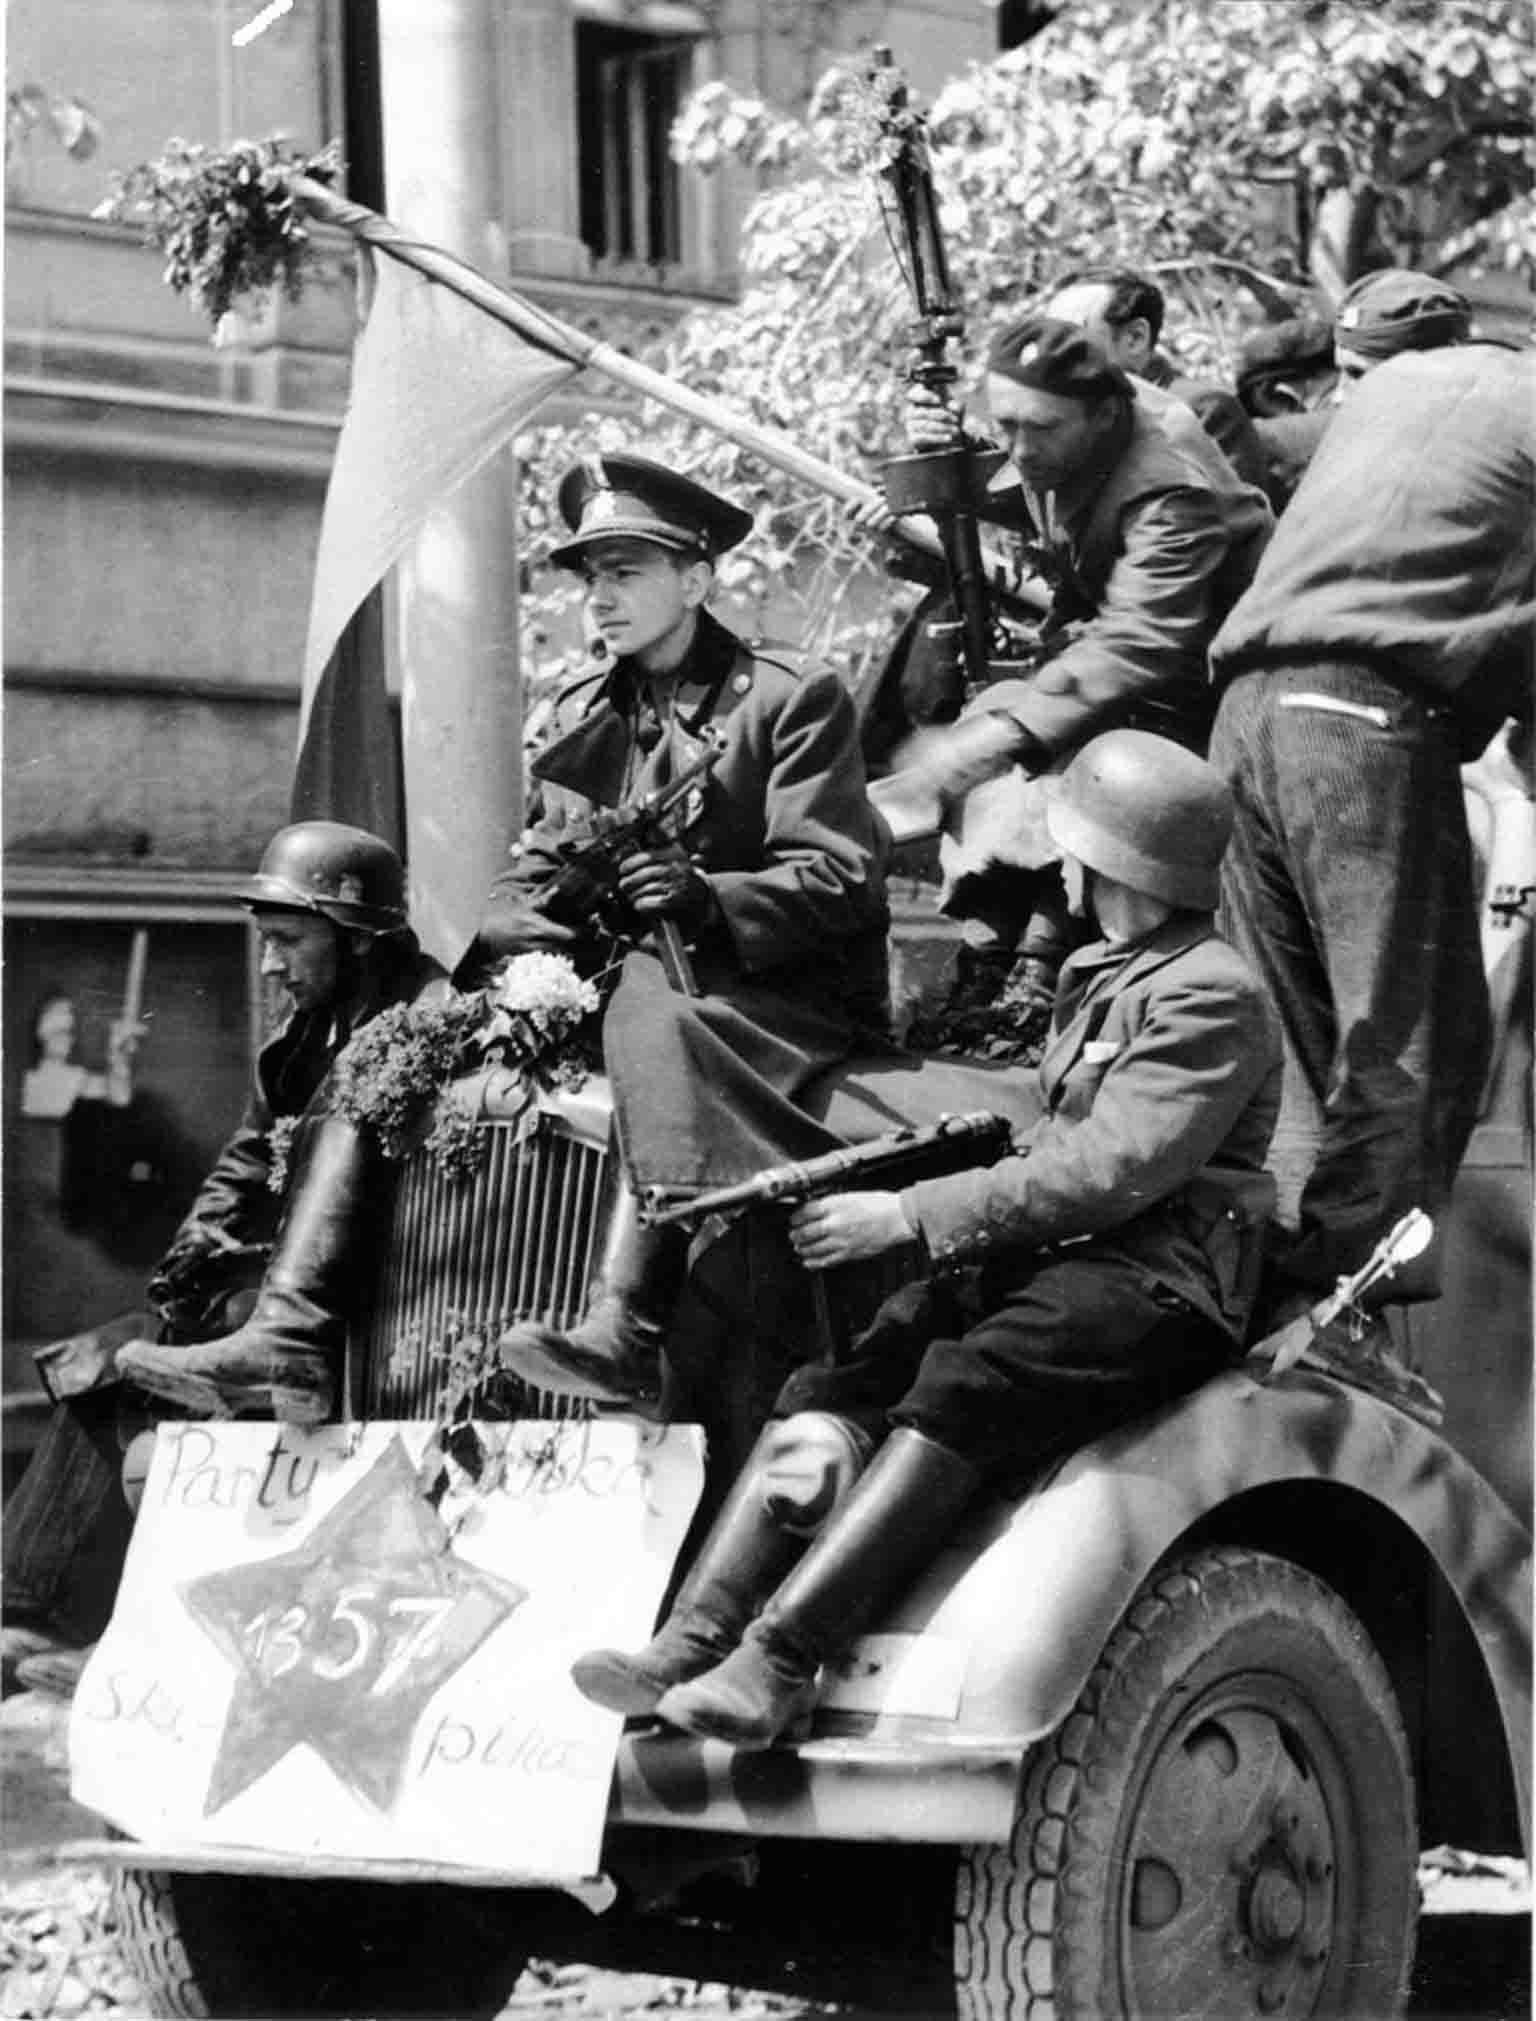 Czechoslovak resistance